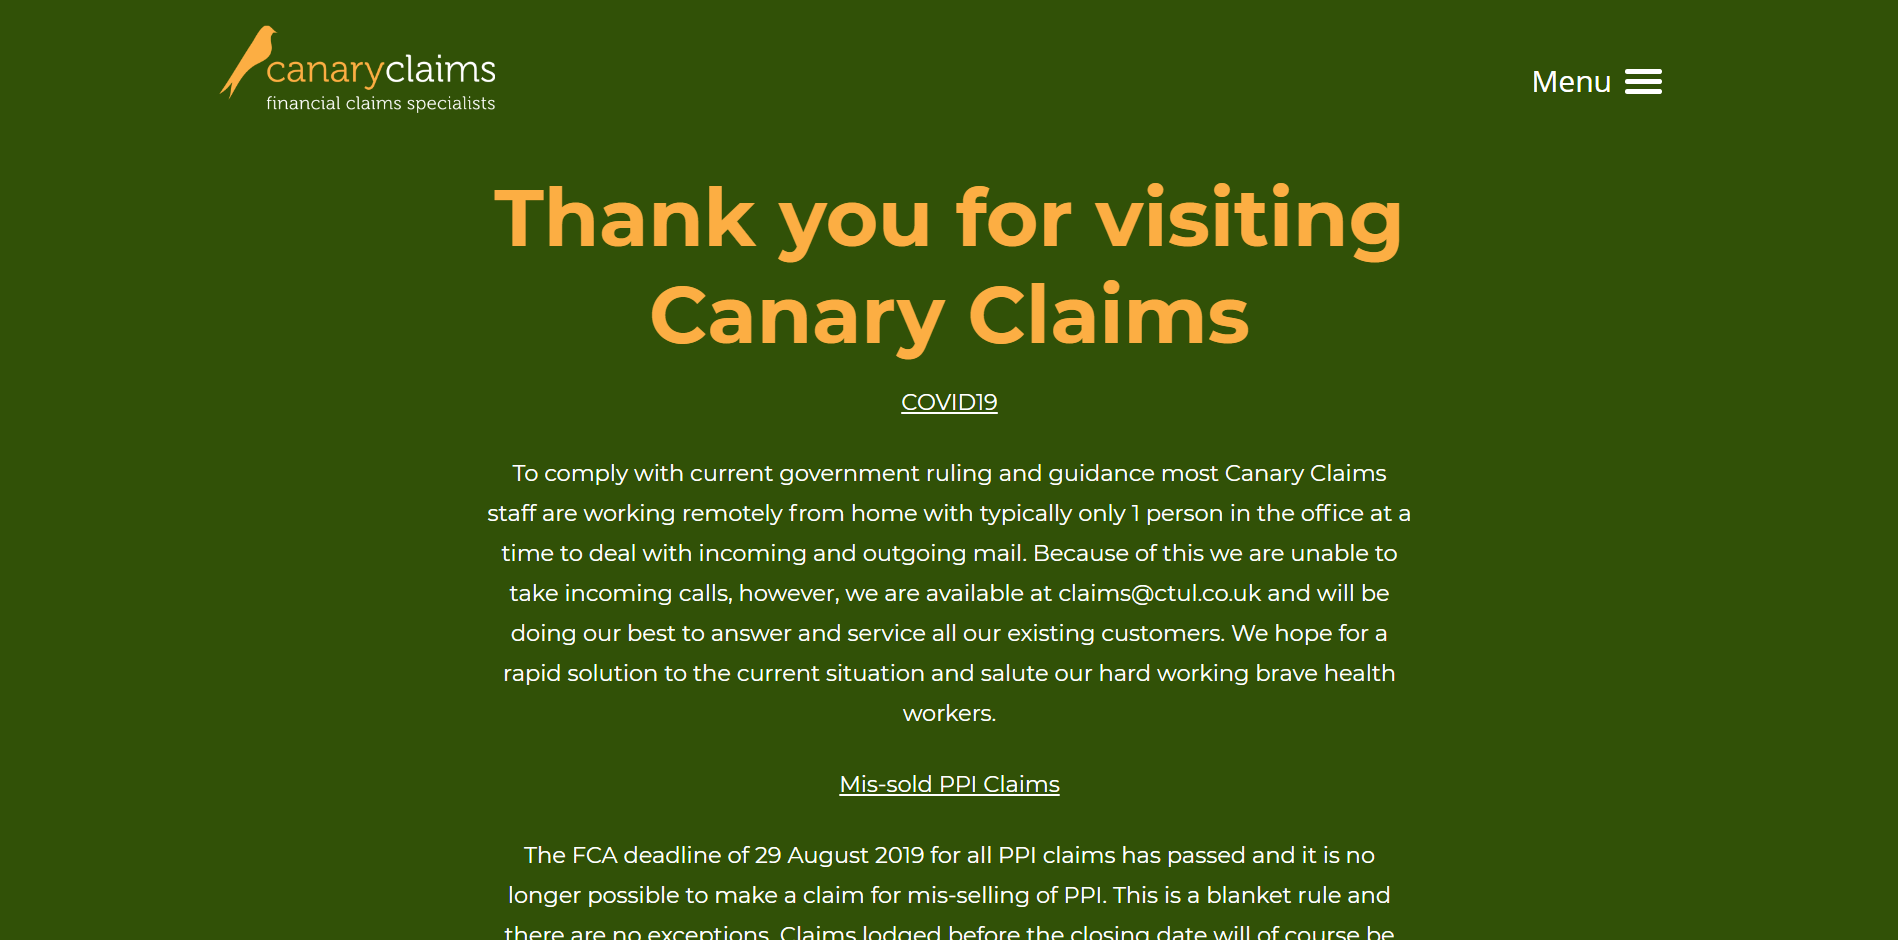 Canary Claims